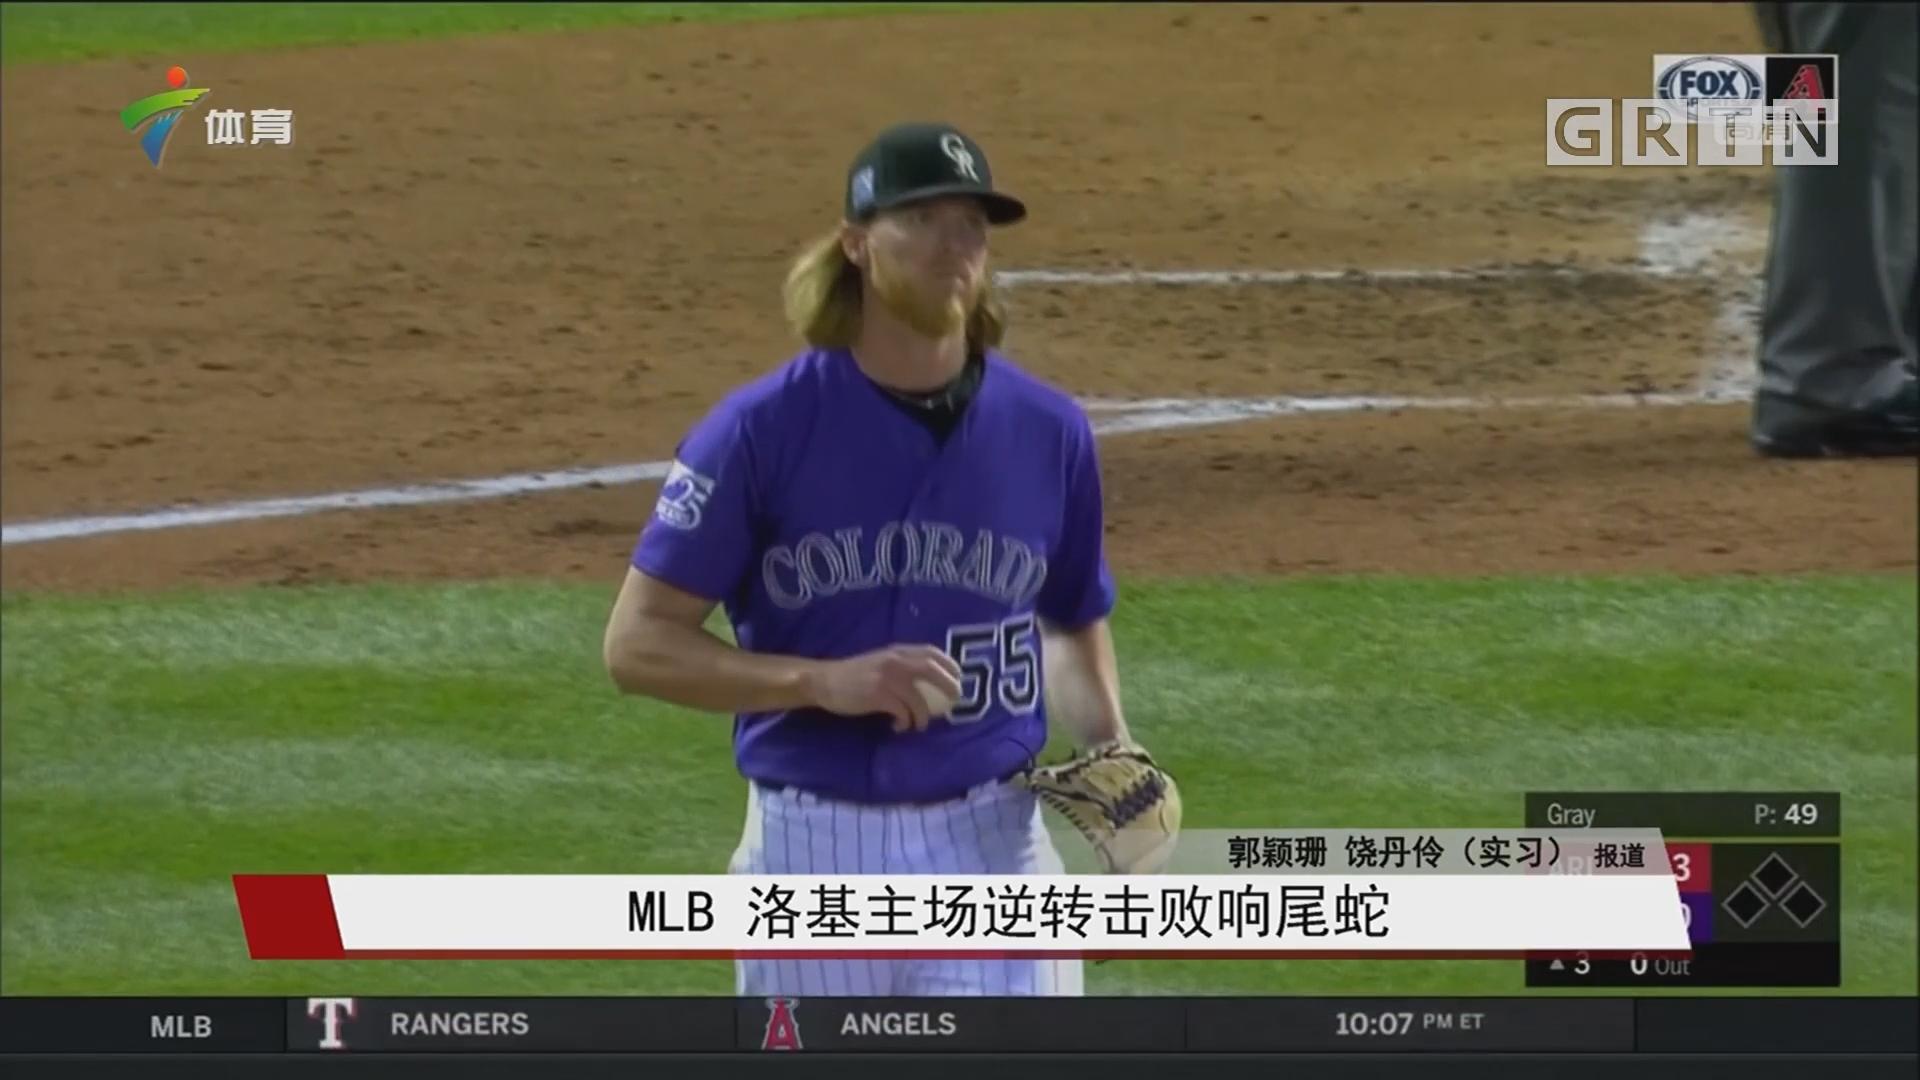 MLB 洛基主场逆转击败响尾蛇